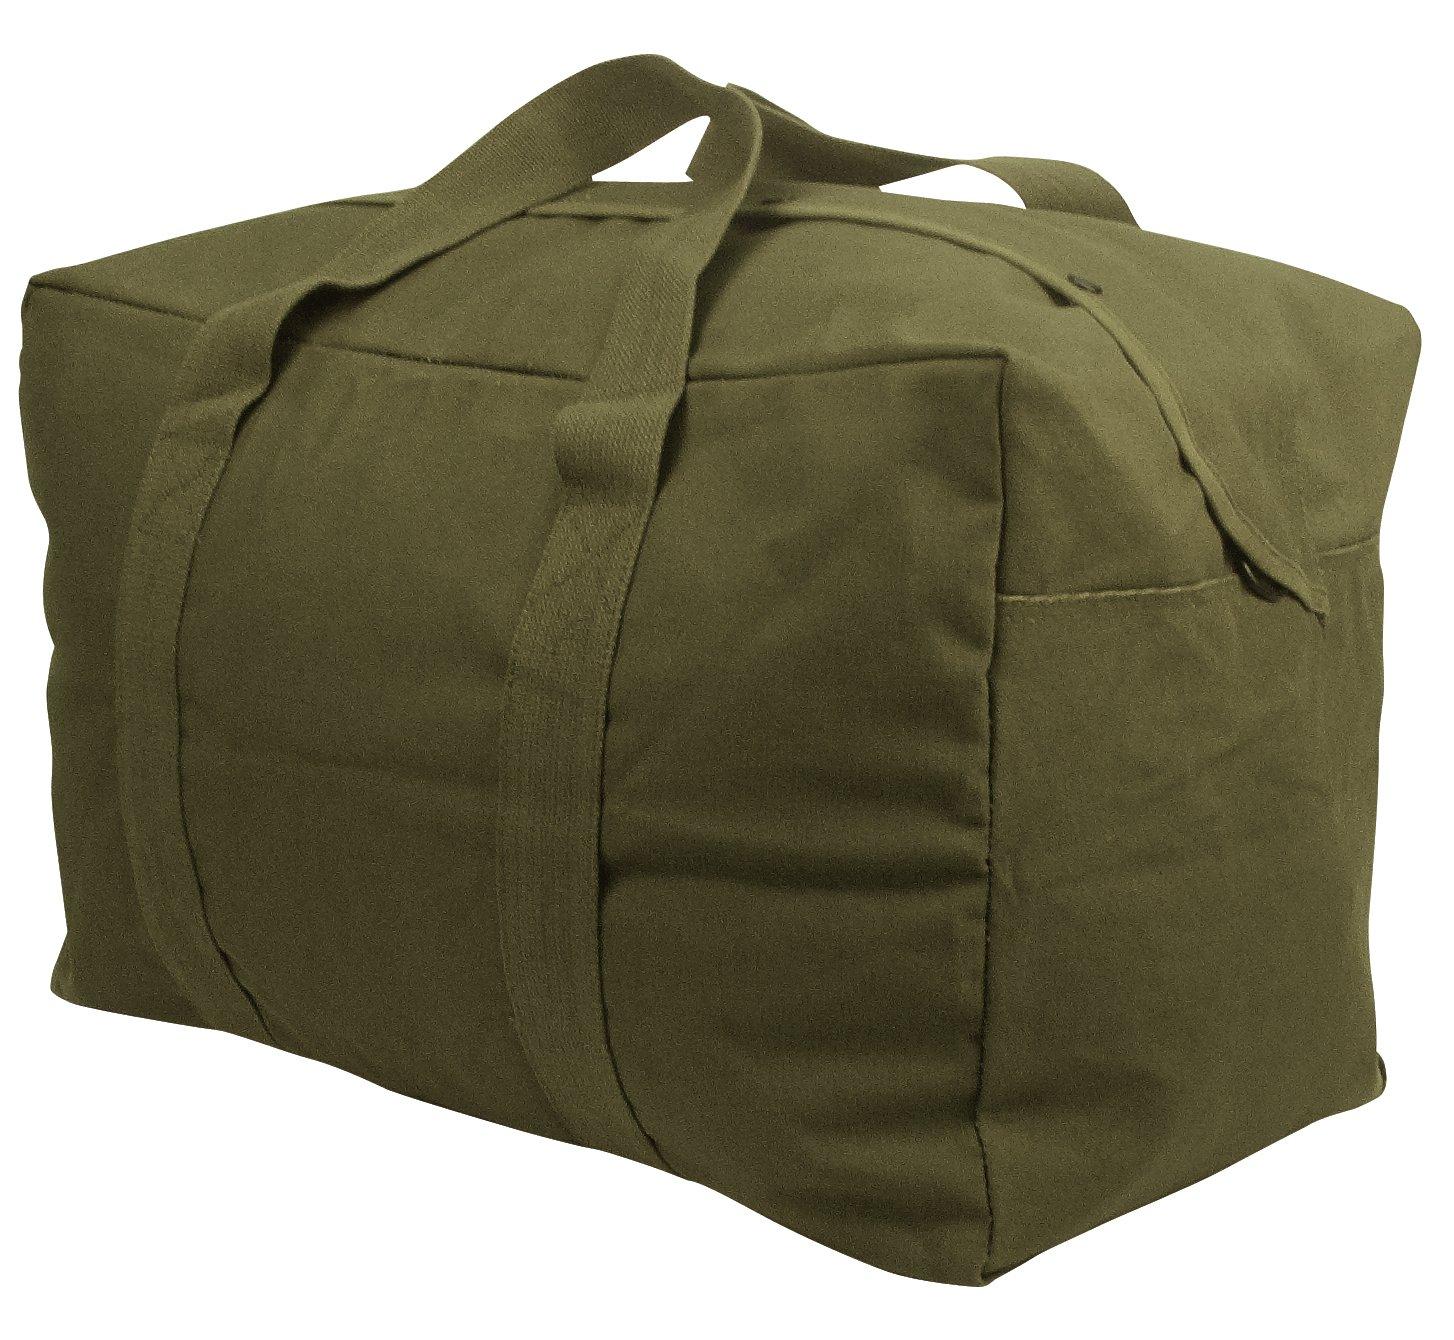 Amazon.com  Rothco Canvas Parachute Cargo Bag  Sports   Outdoors c105ac93d6c